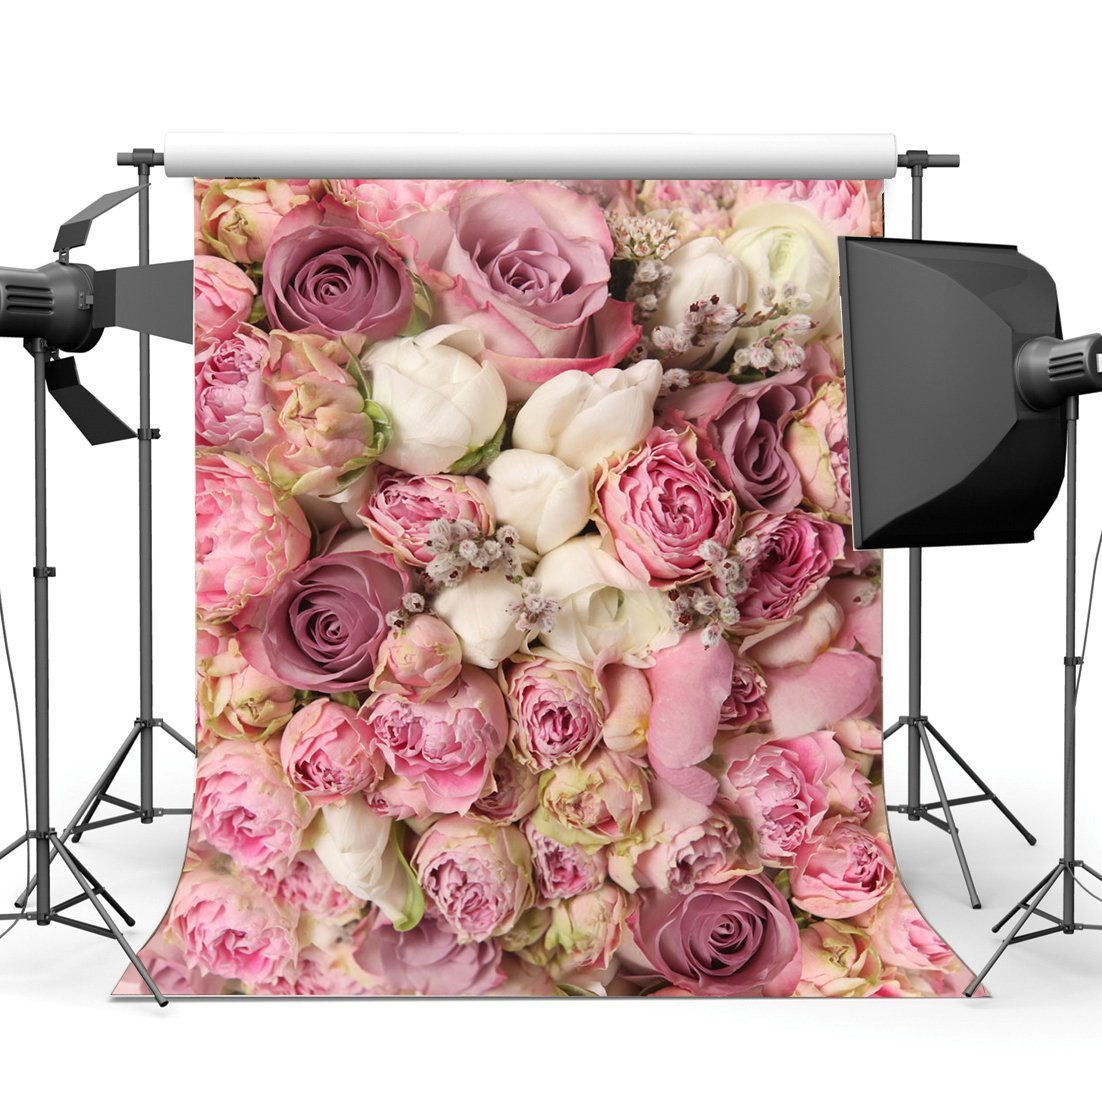 Valentine Day Flowers Digital Photography Background Cloth Studio Backdrop *DC